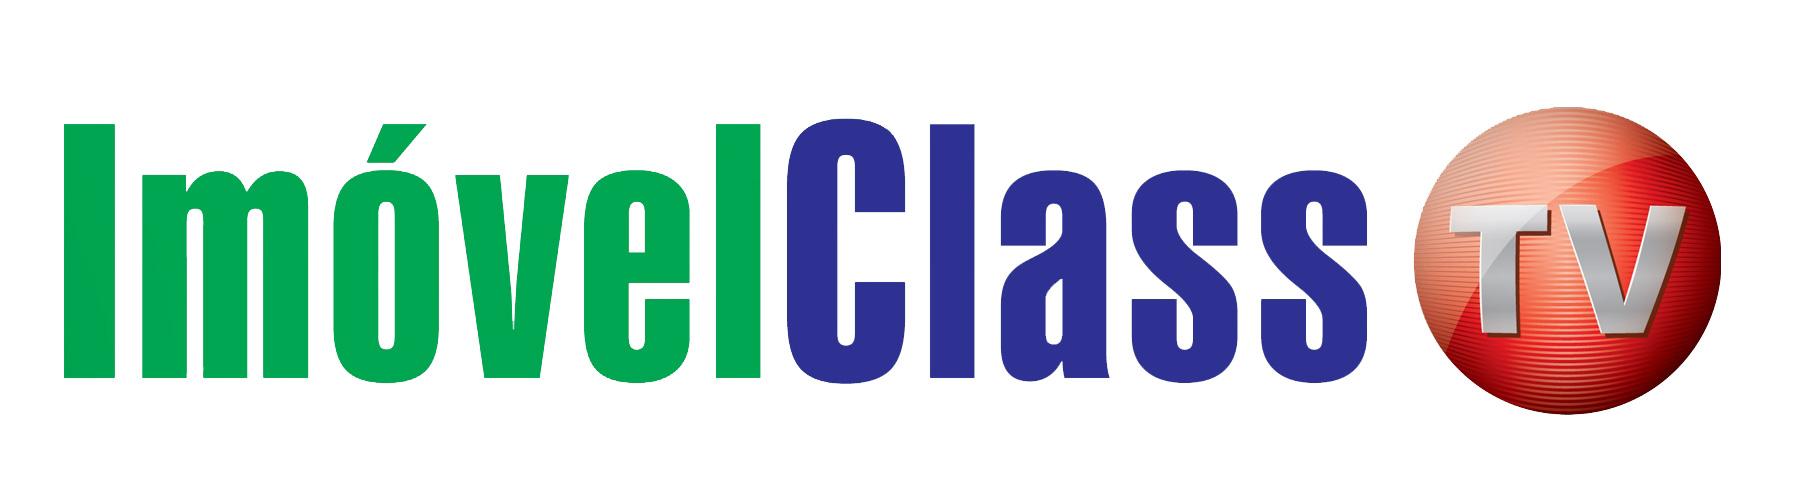 ImovelClass-TV